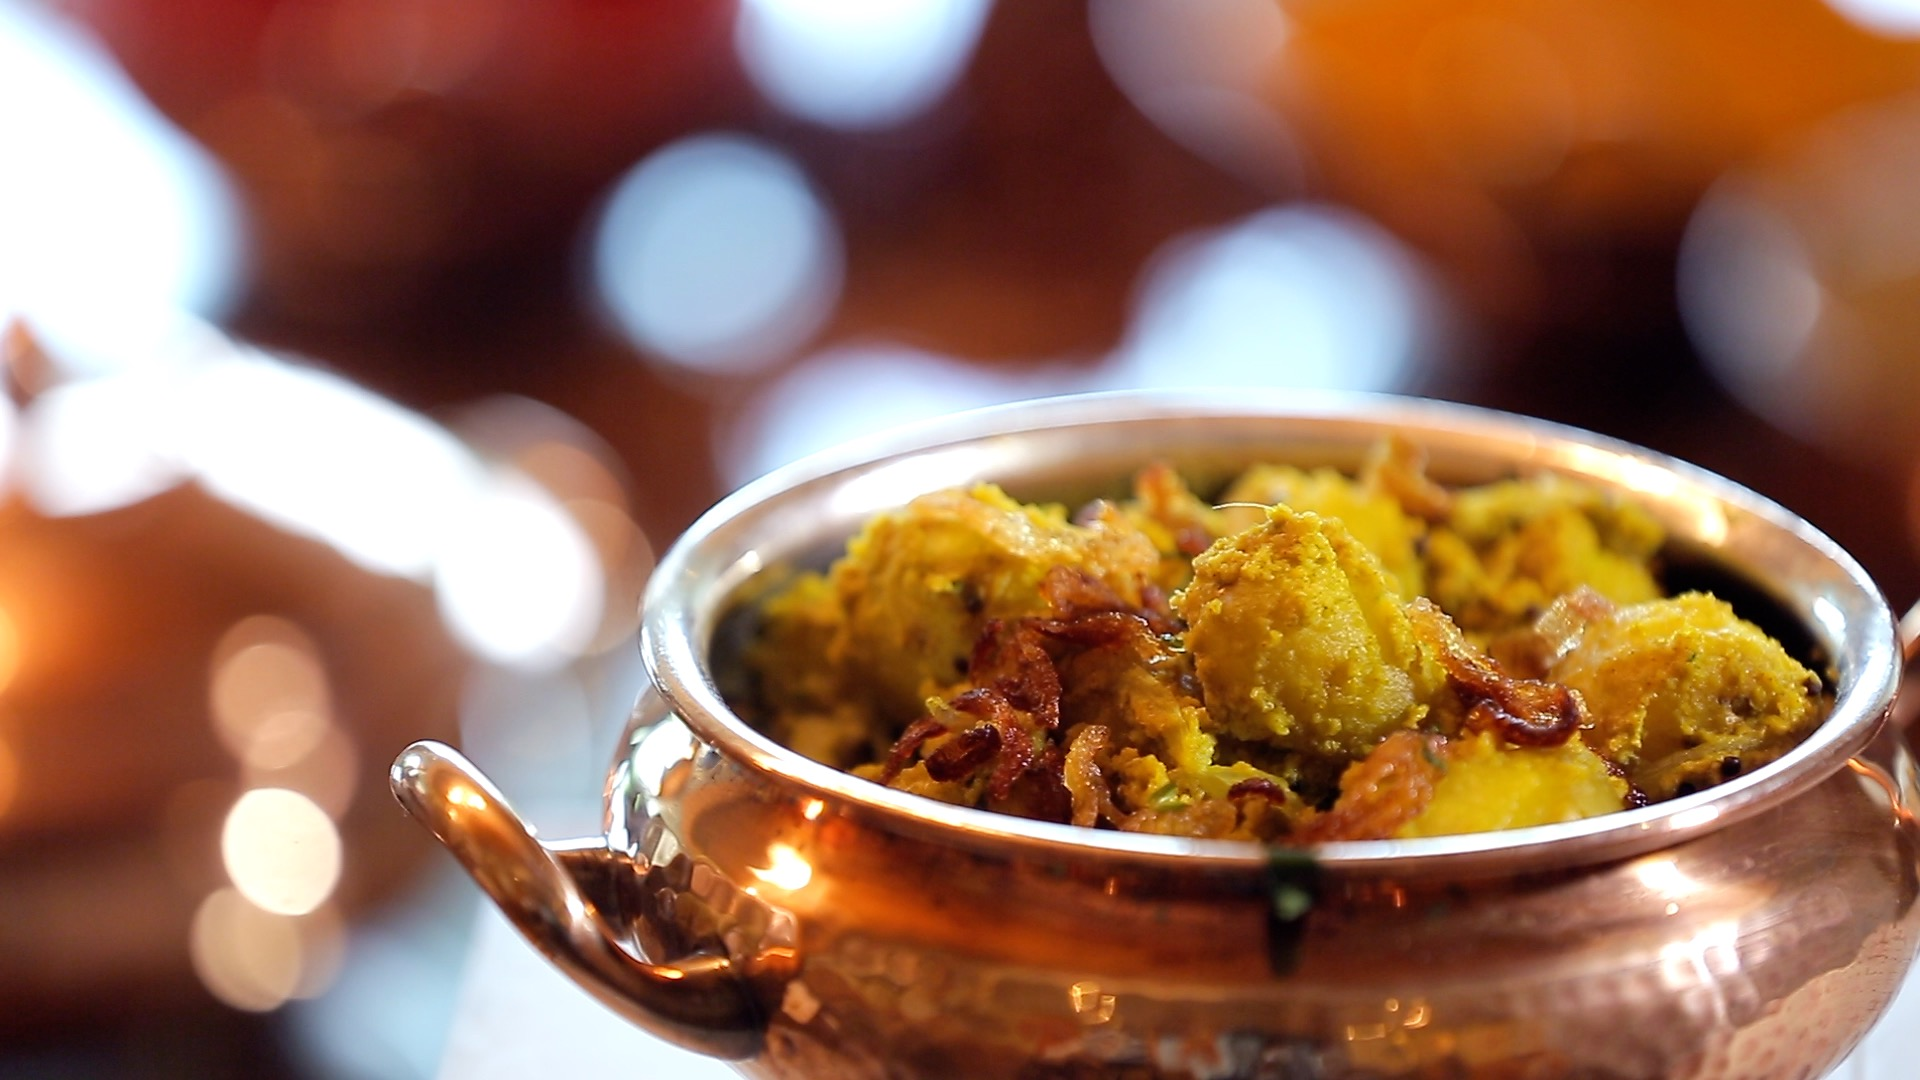 Best Wine Brands in India: Best Indian Red Wines, Popular